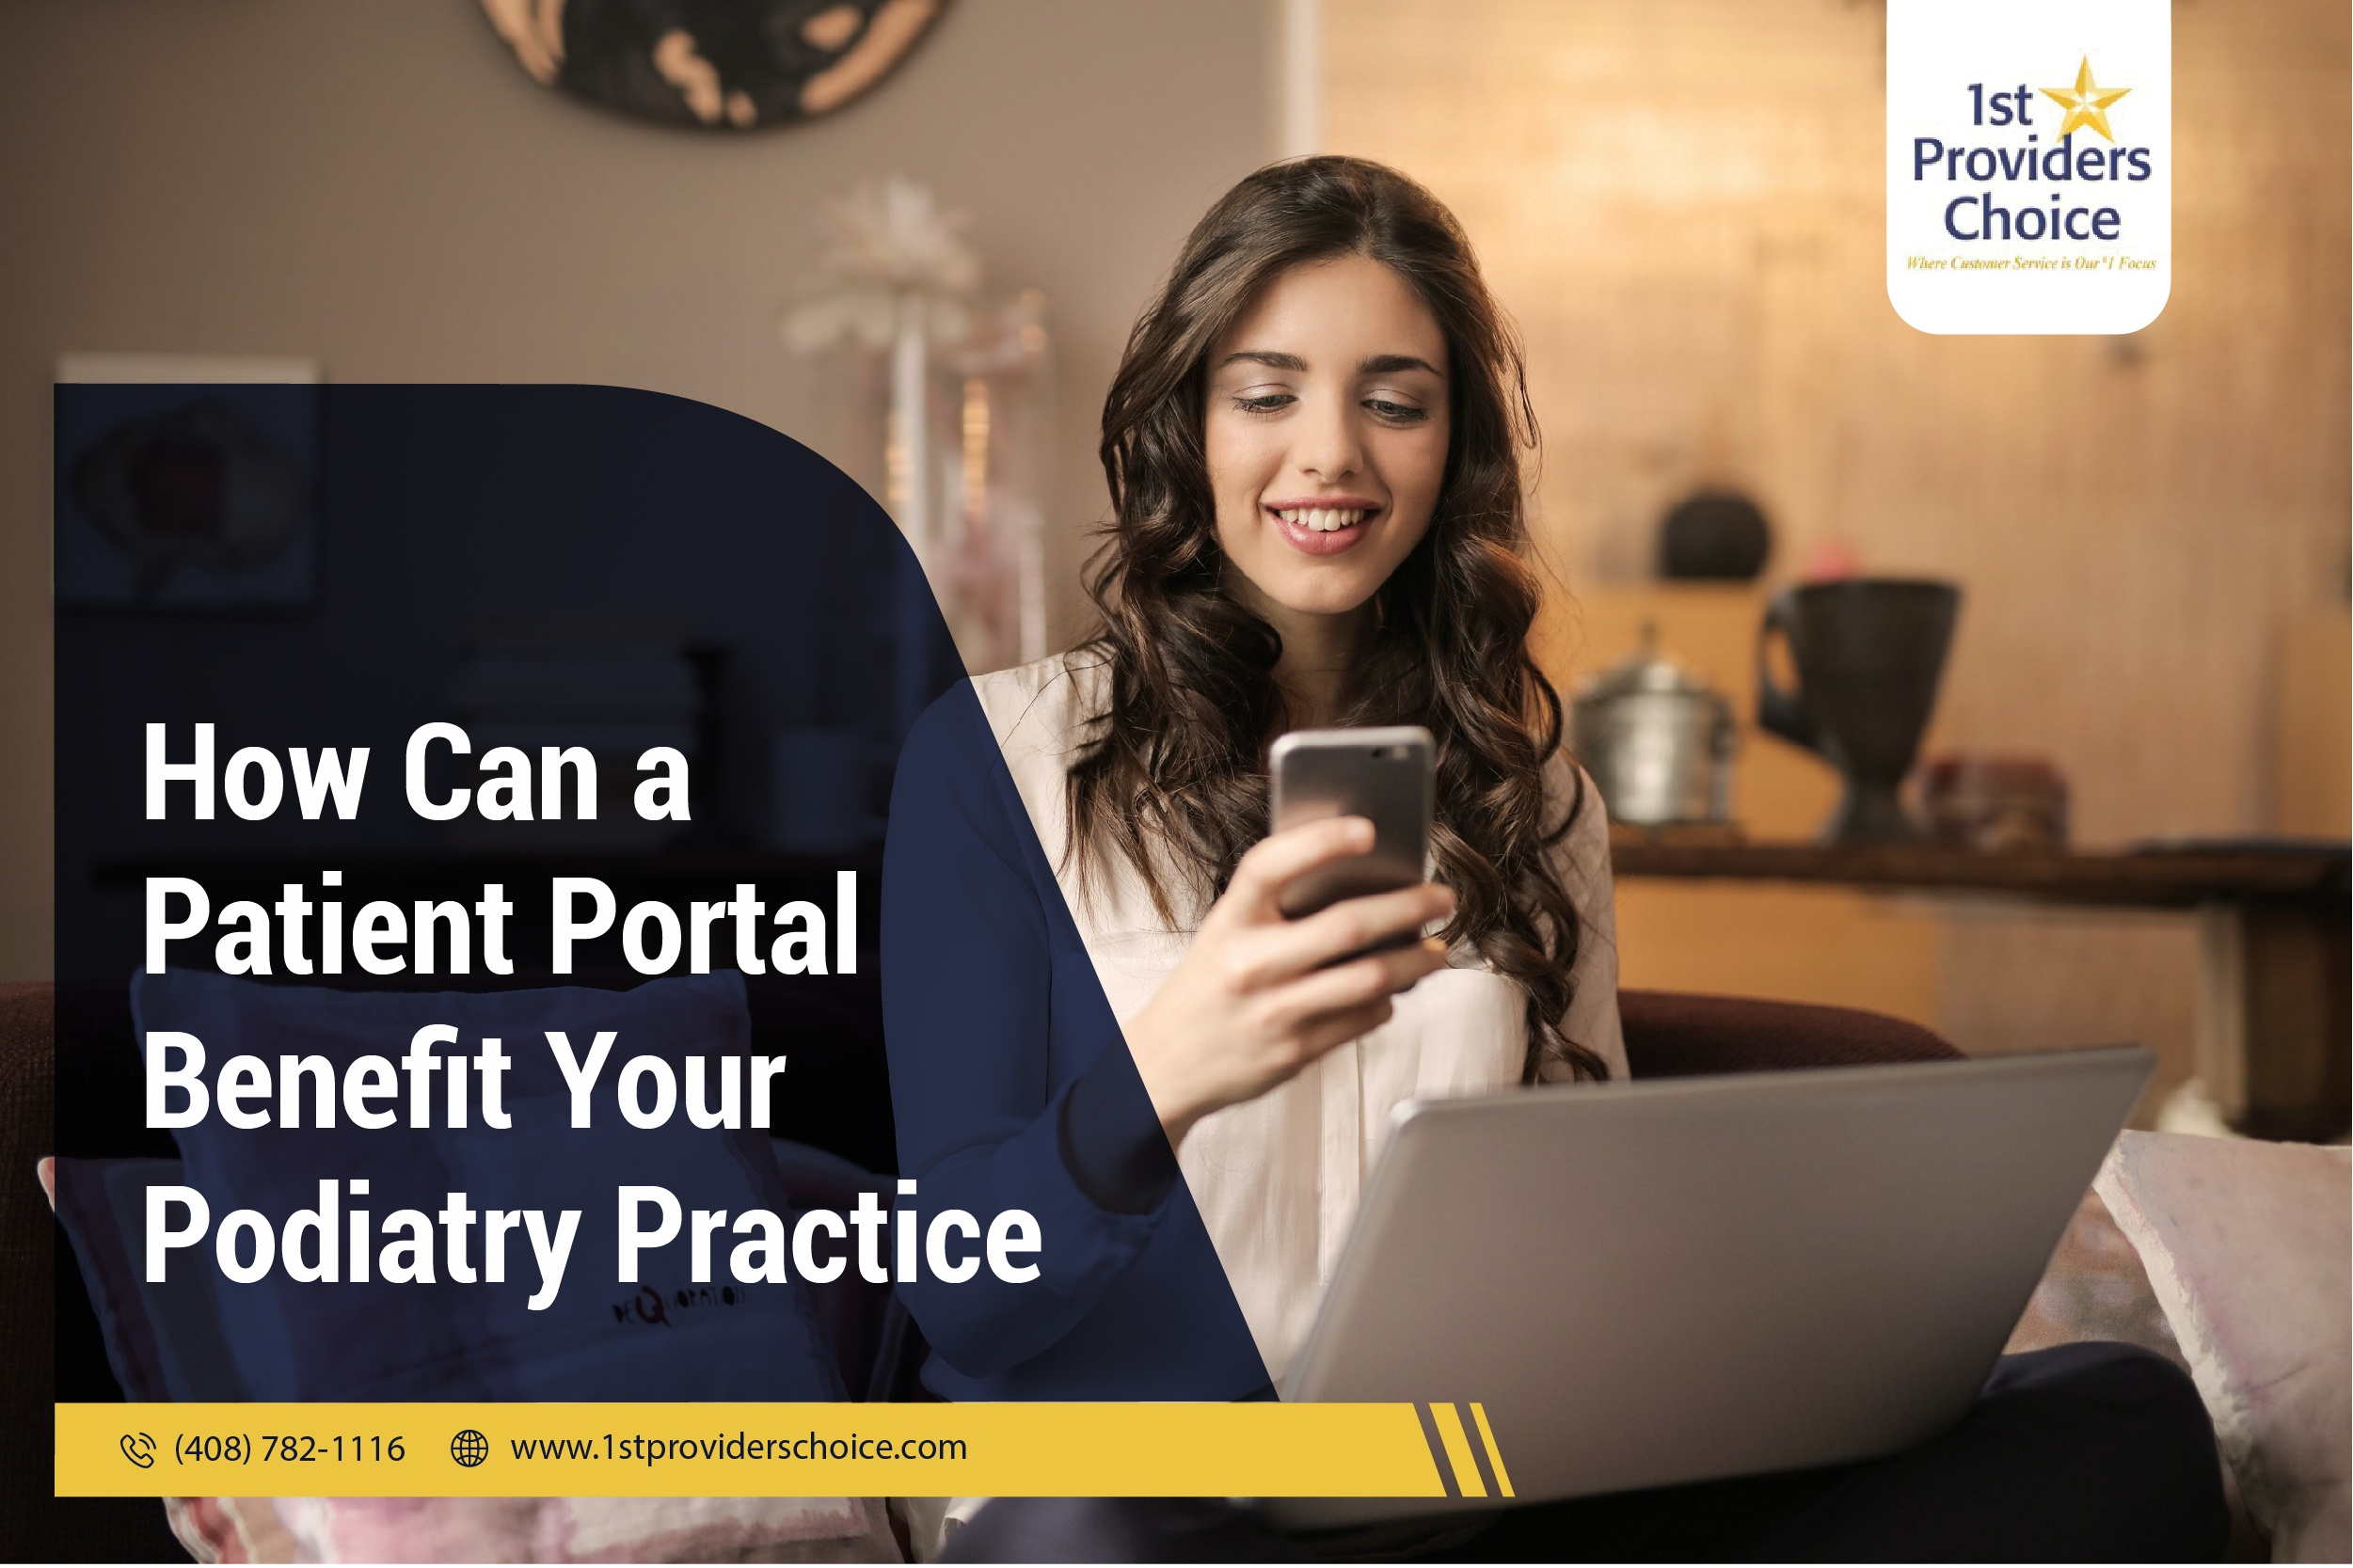 Patient Portal for Podiatry Practices